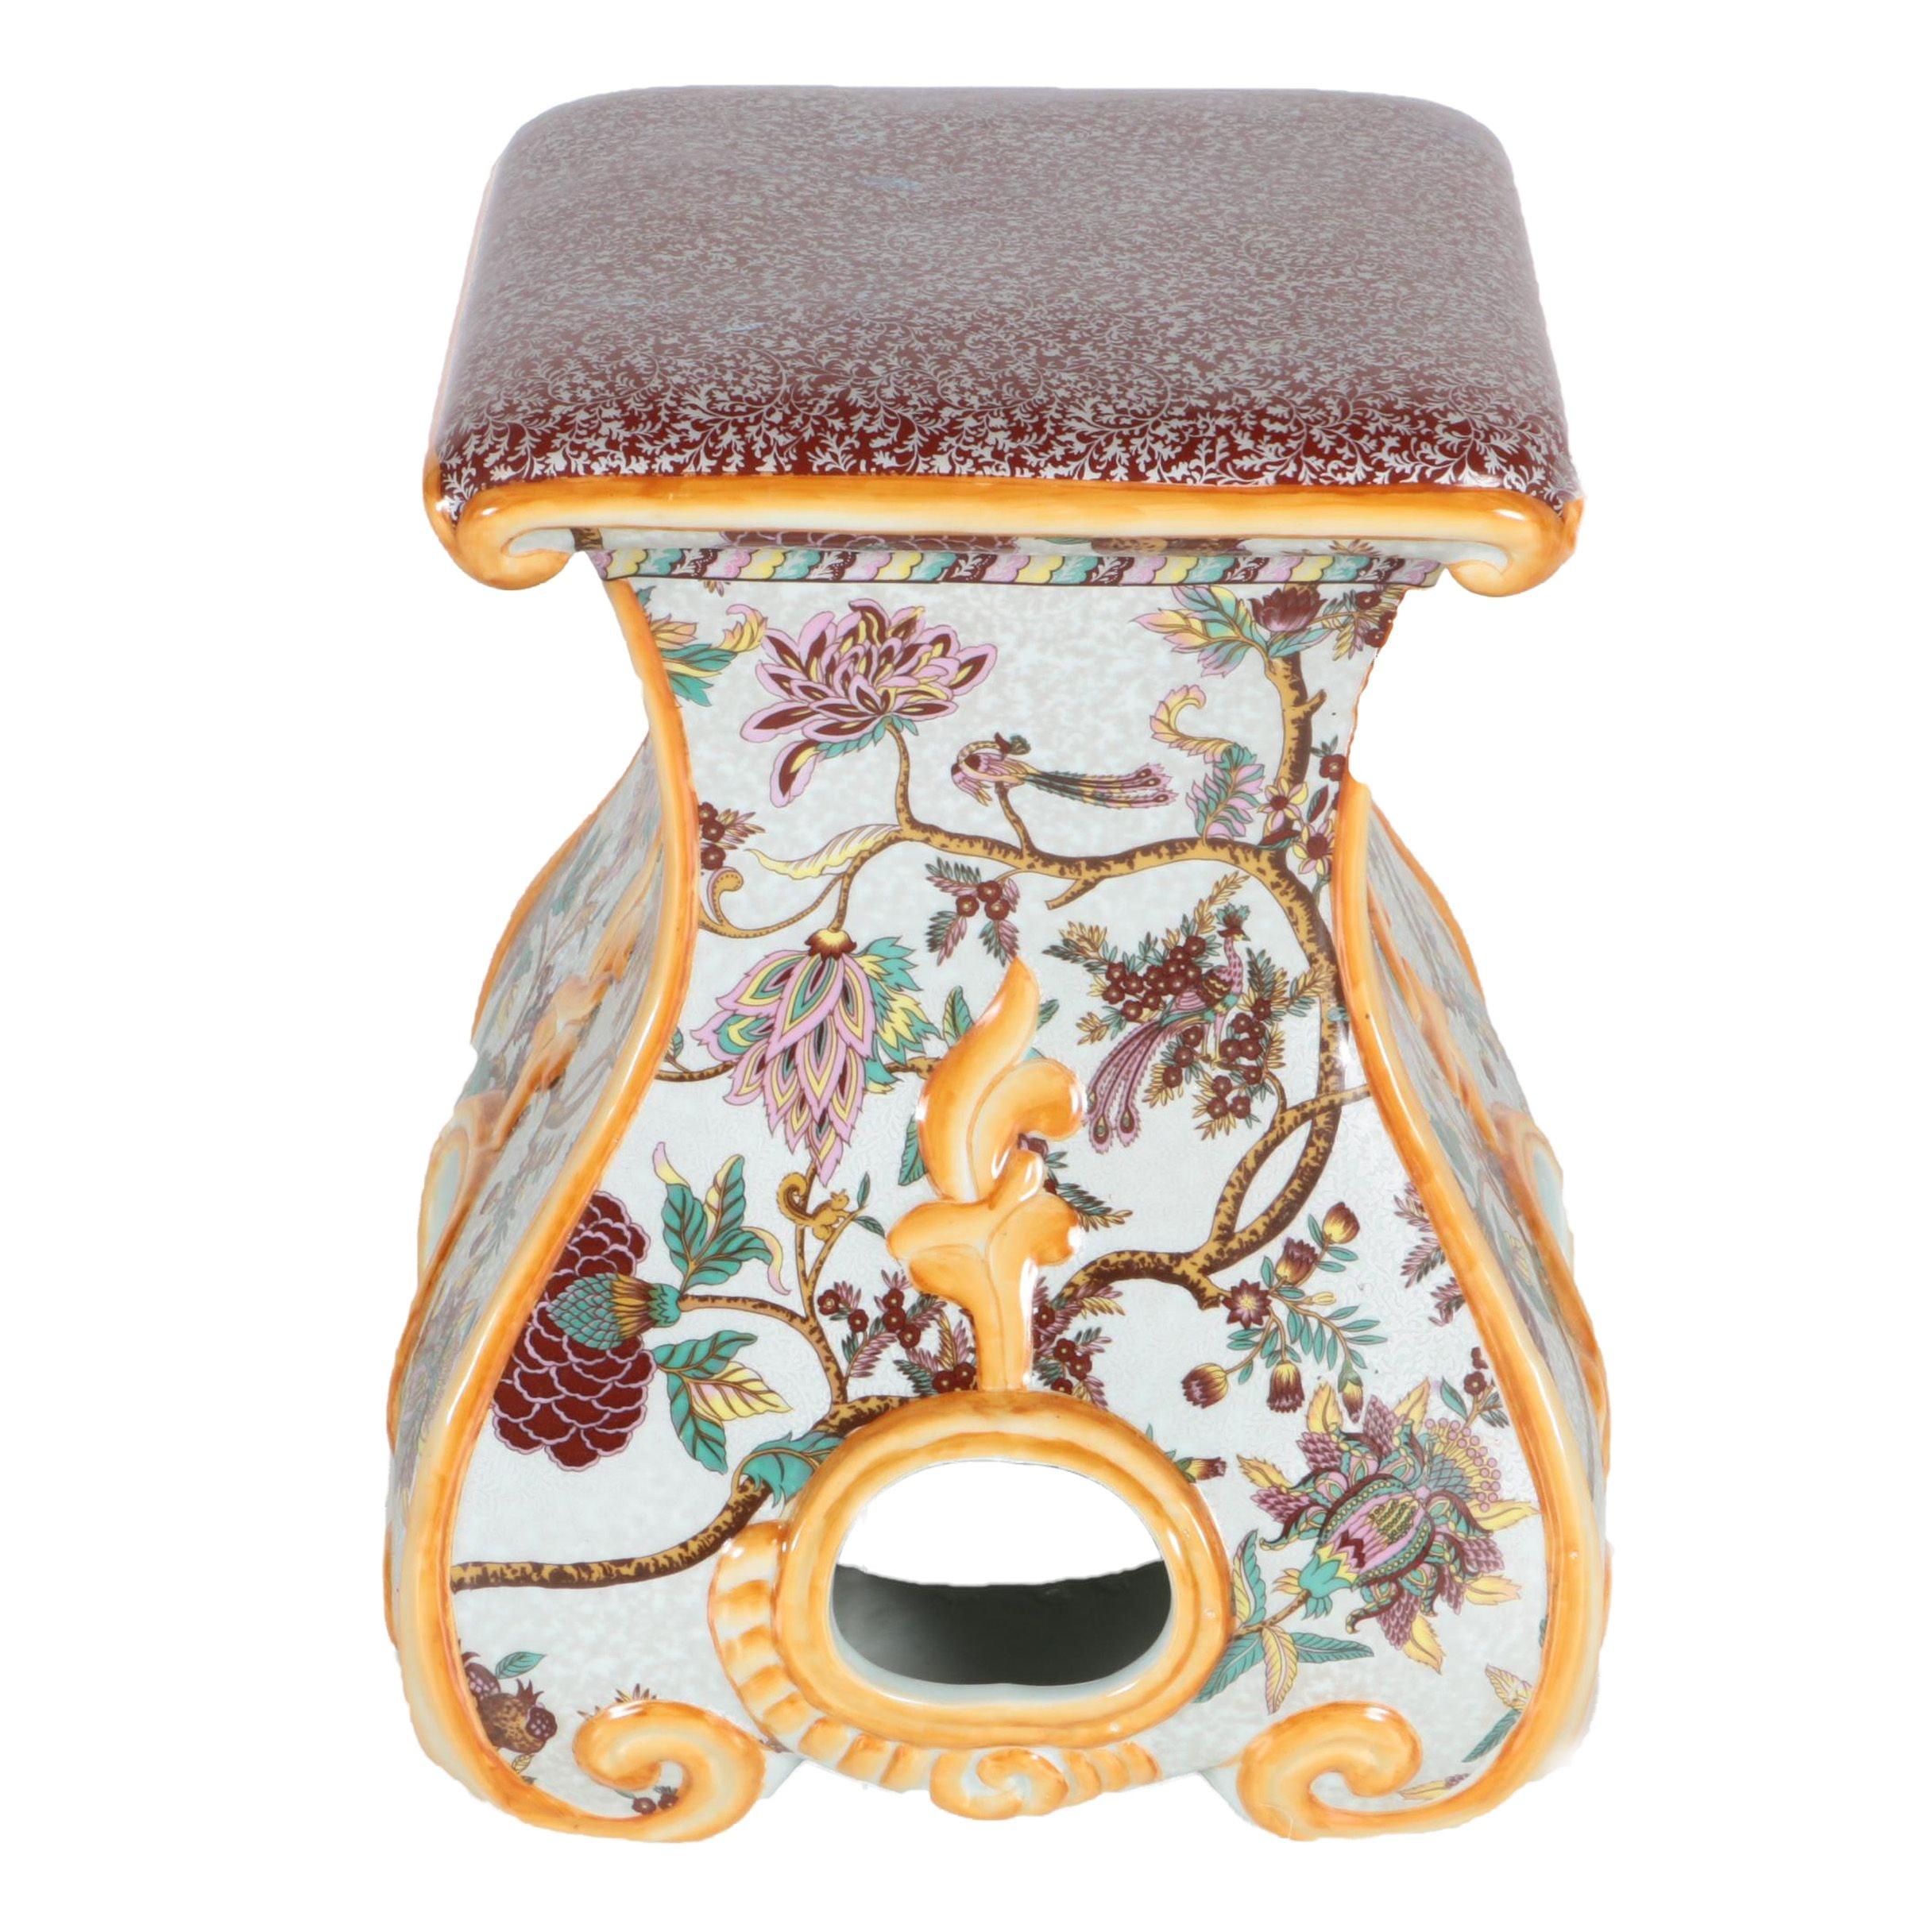 Chinese Inspired Ceramic Garden Stool Ebth